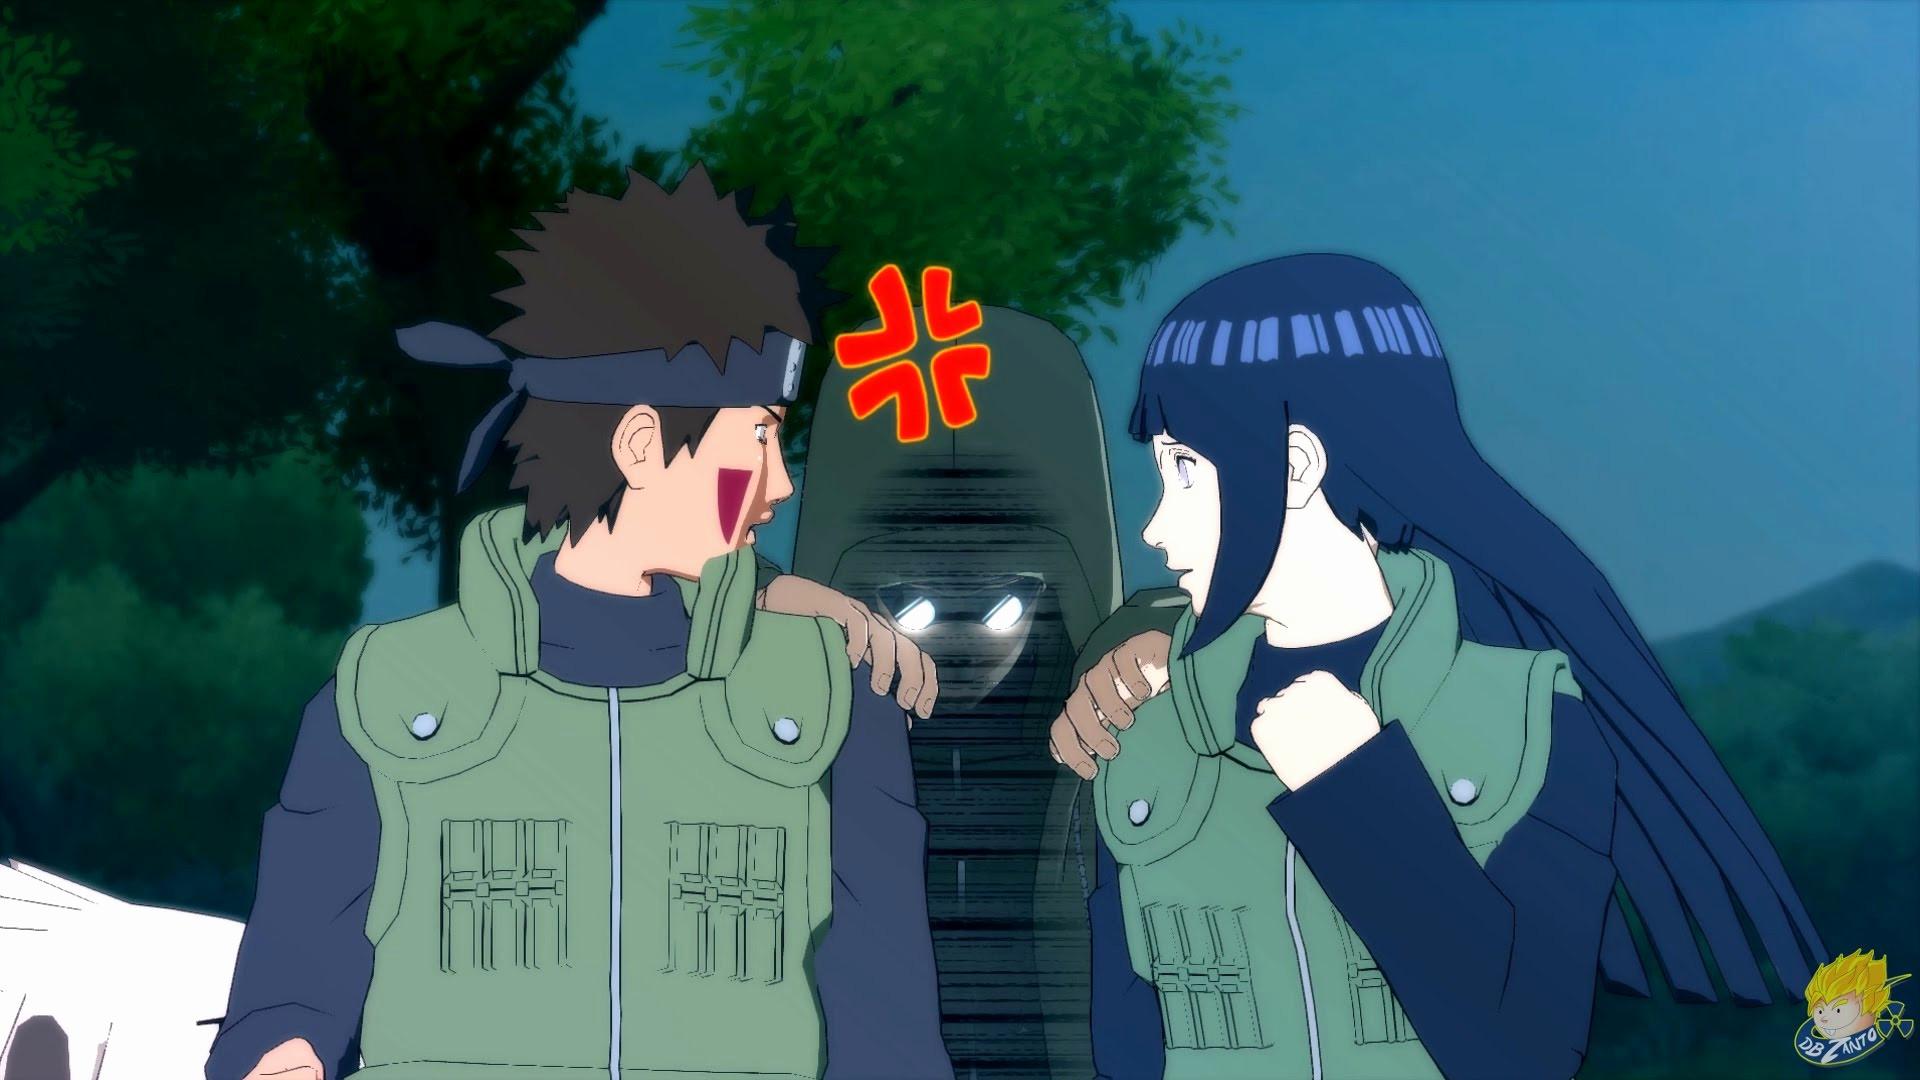 Res: 1920x1080, ... Naruto Shippuden Kiba Lovely Naruto Shippuden Ultimate Ninja Storm 4  Hinata Kiba Shino Team ...